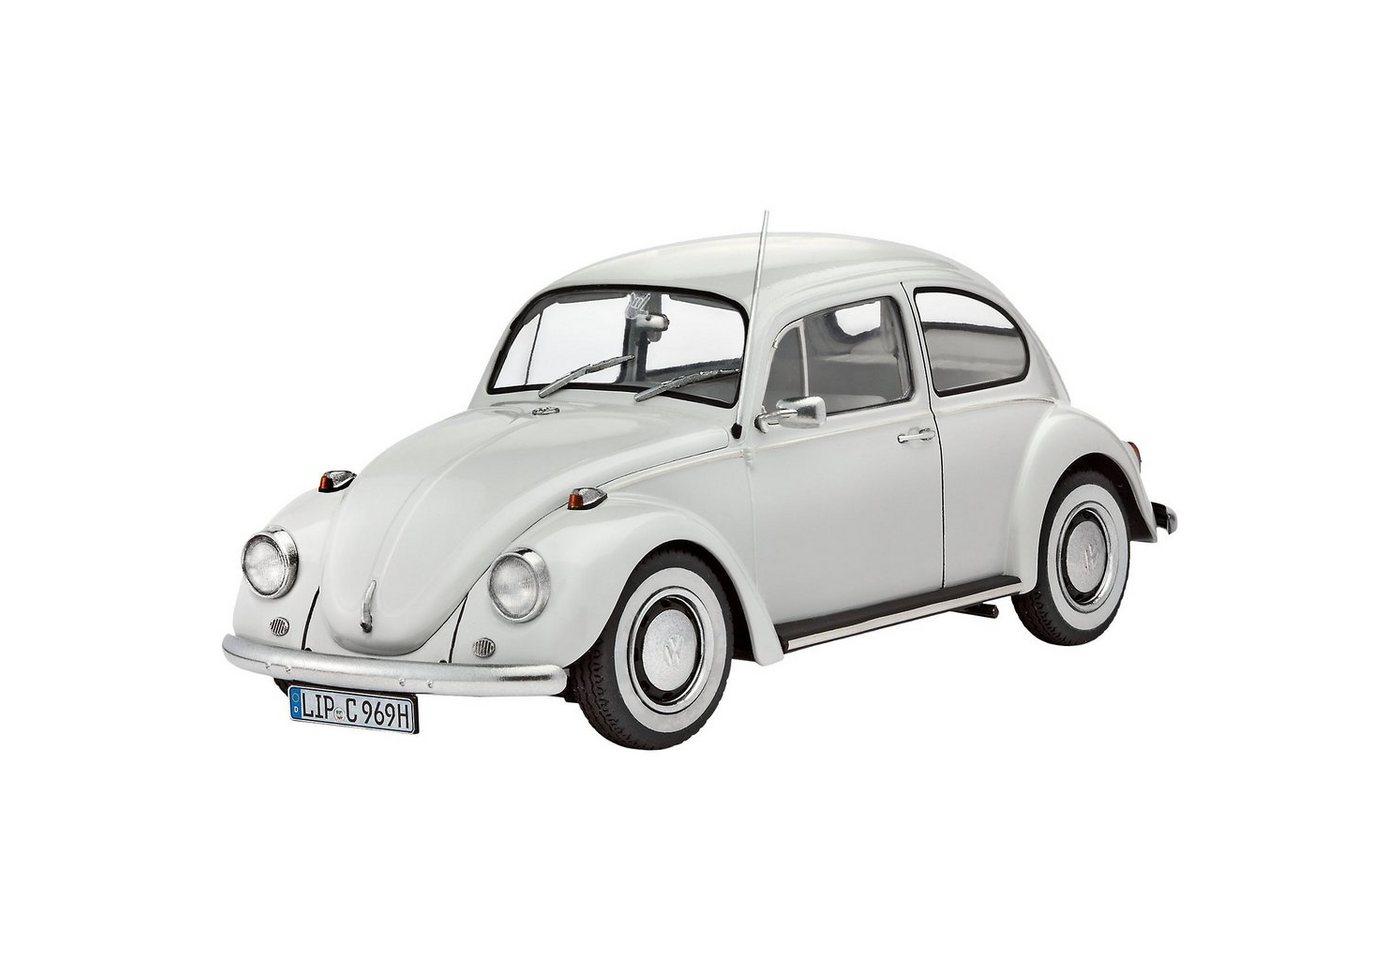 Revell® Modellbausatz VW Beetle Limousine 1968 im Maßstab 1:24